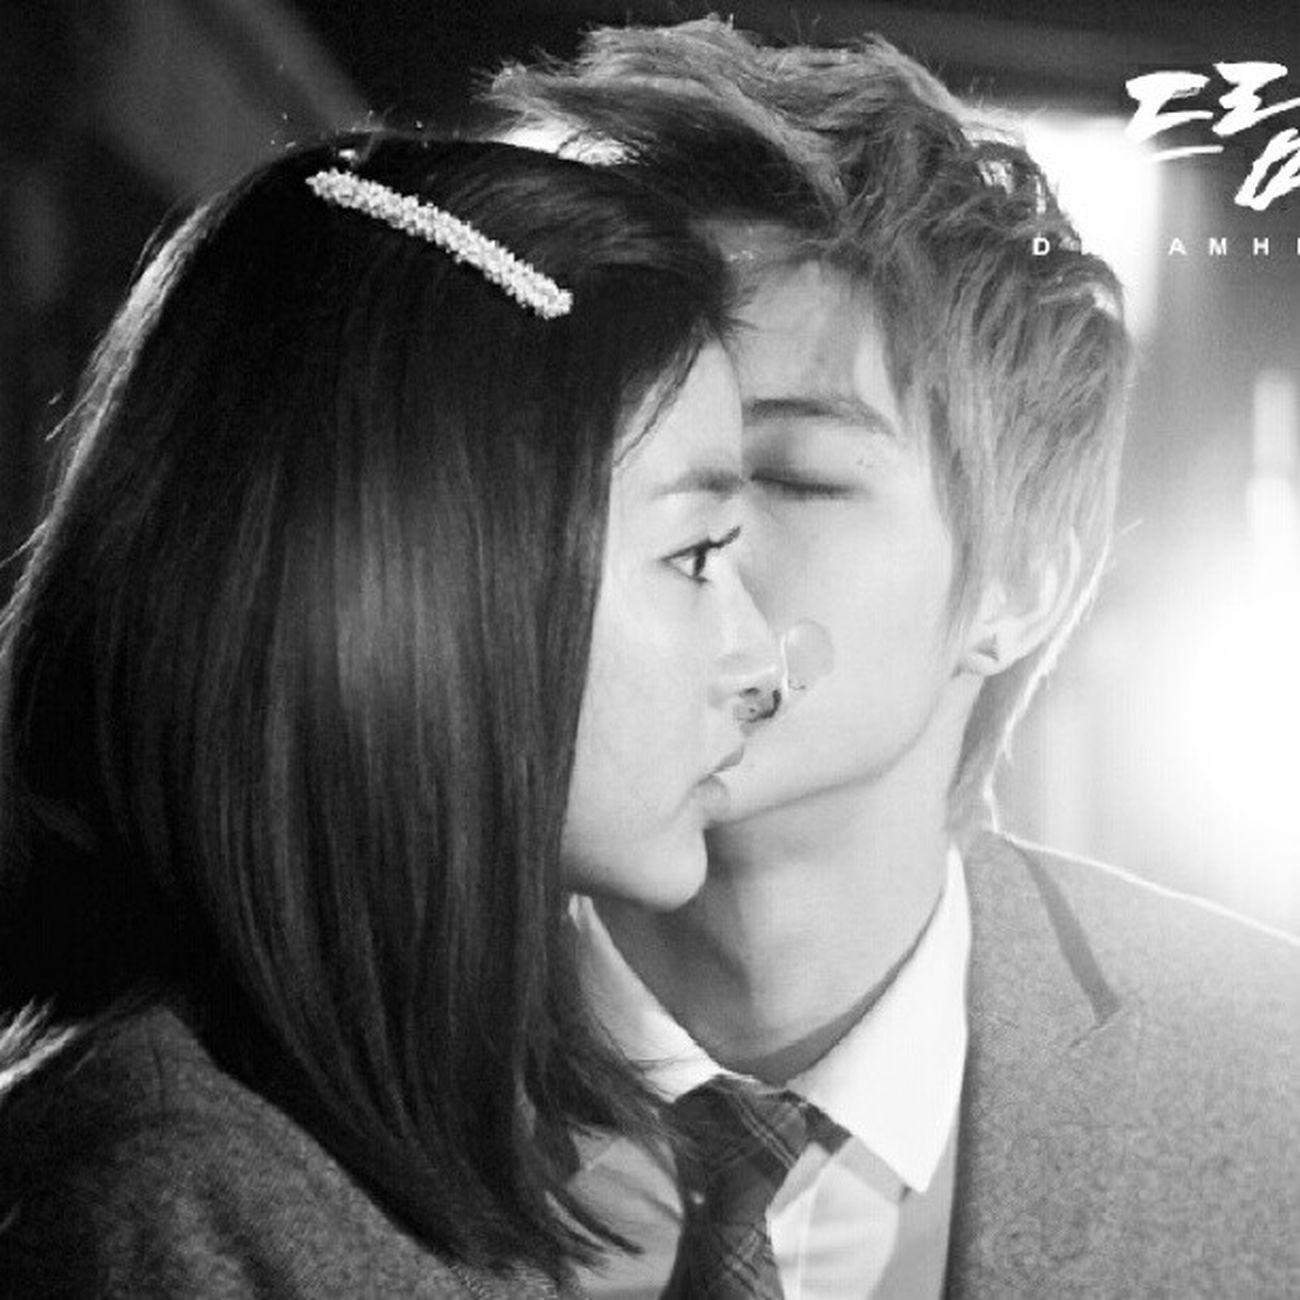 Kissing scene Kangsora Love Jaebum Rubikcouples dreamhigh2 kiligmuch sweet